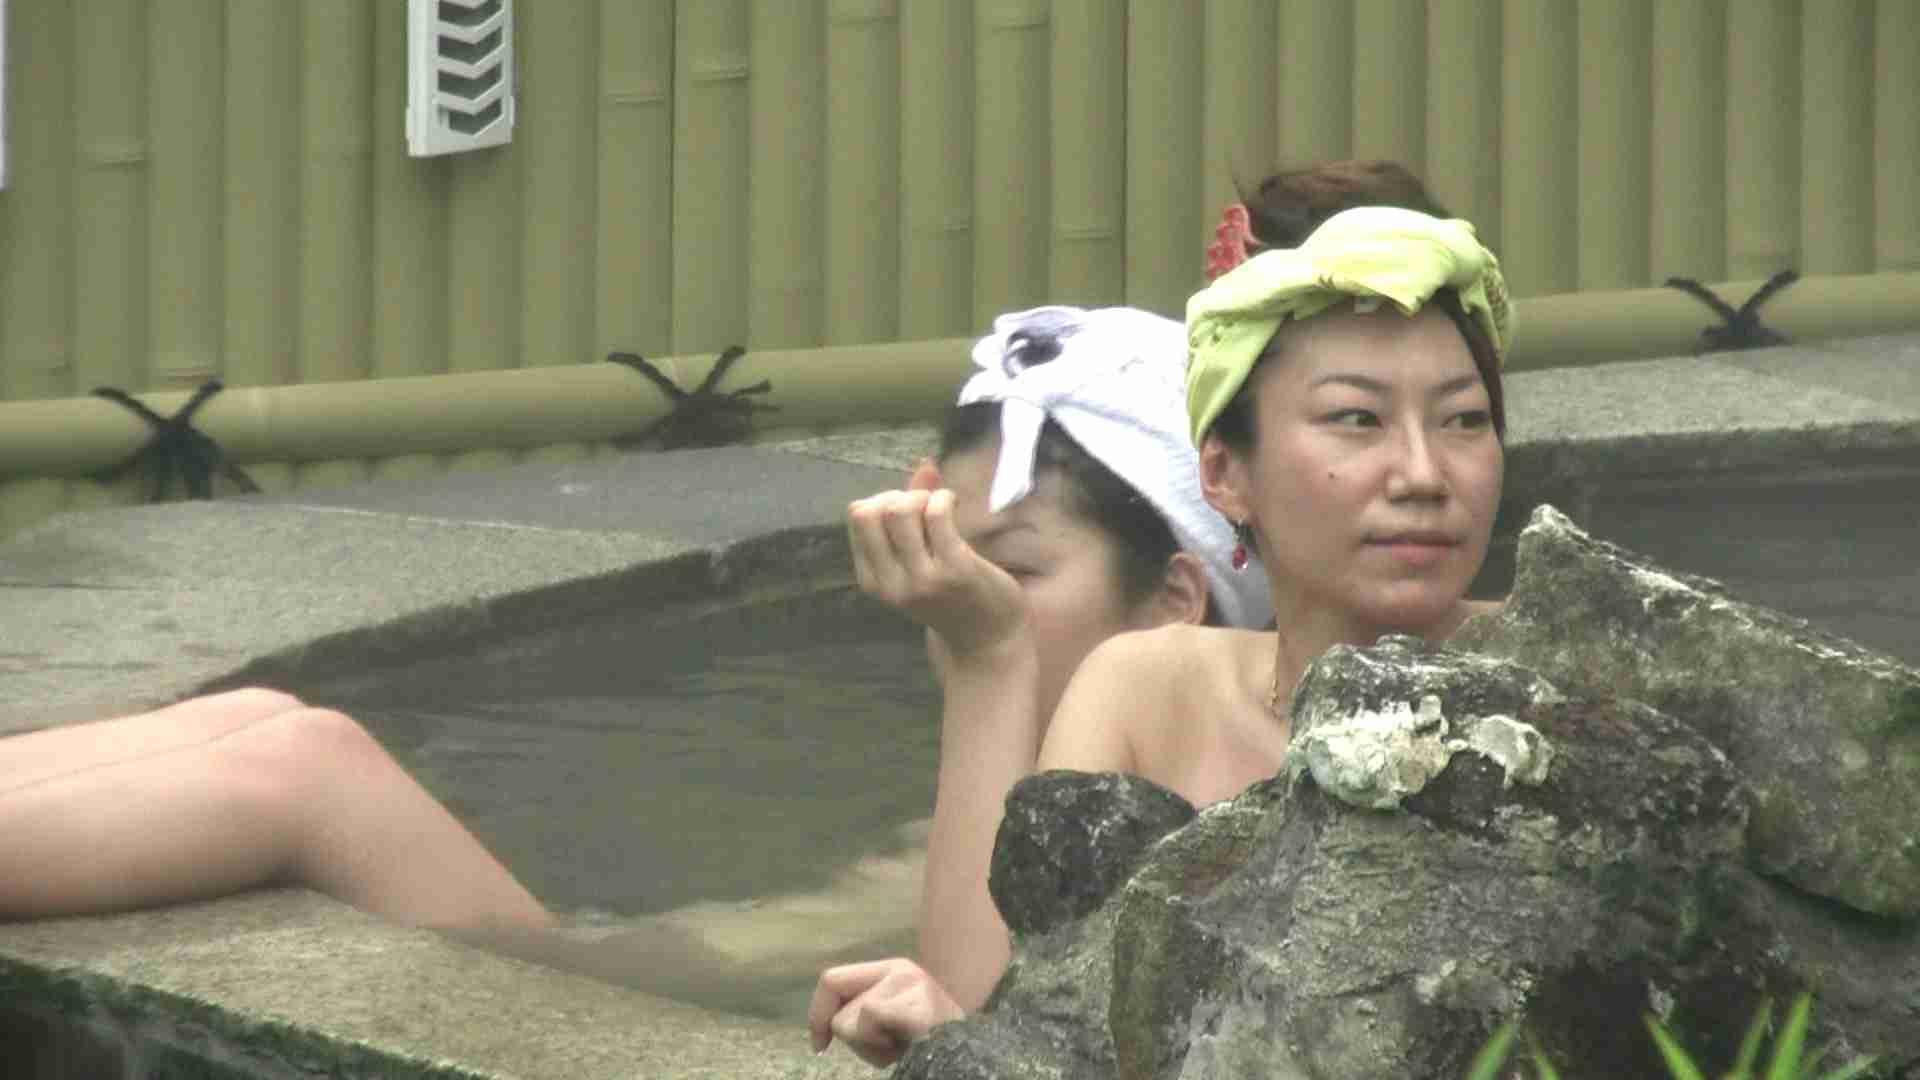 Aquaな露天風呂Vol.192 美しいOLの裸体 えろ無修正画像 101pic 68